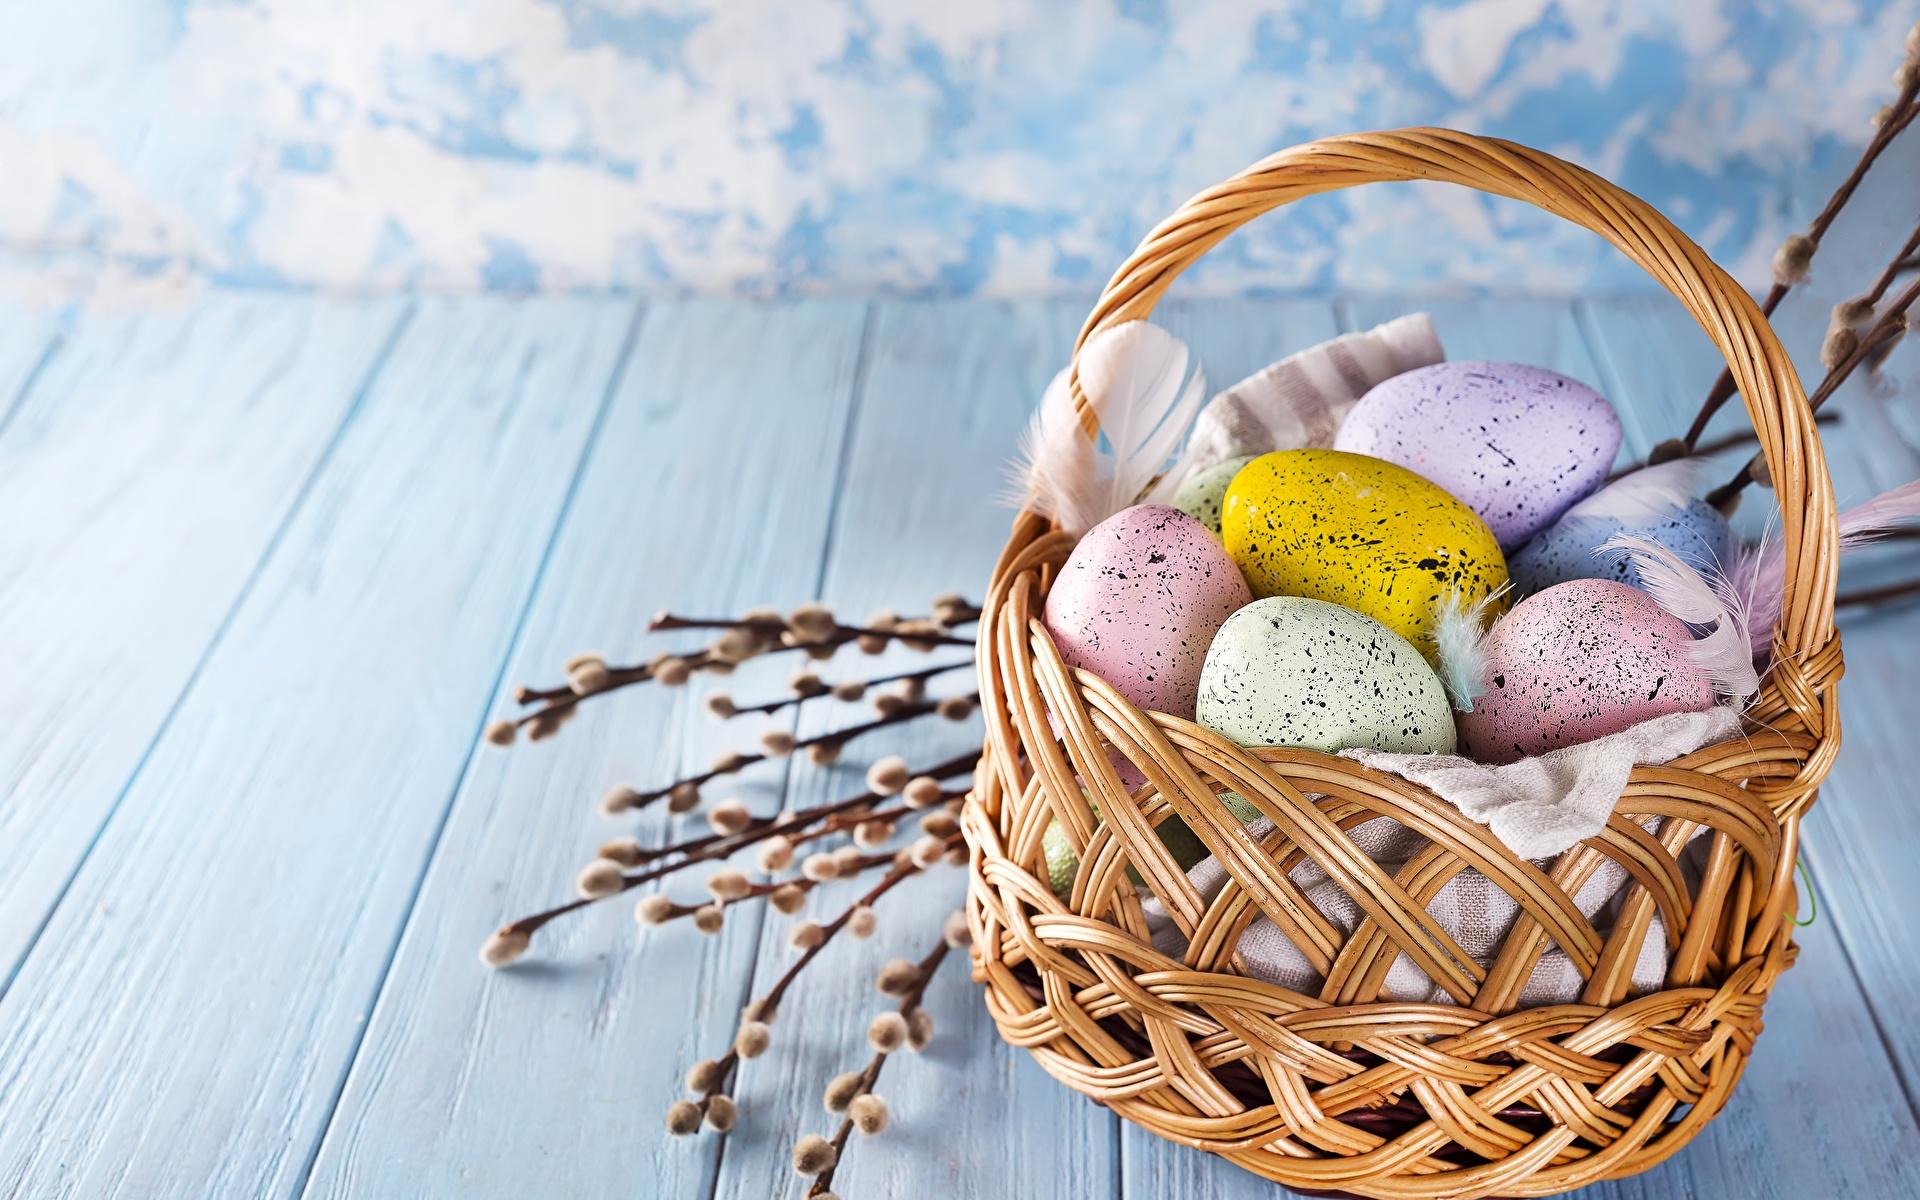 Фотографии Пасха яиц Корзинка 1920x1200 яйцо Яйца яйцами Корзина корзины